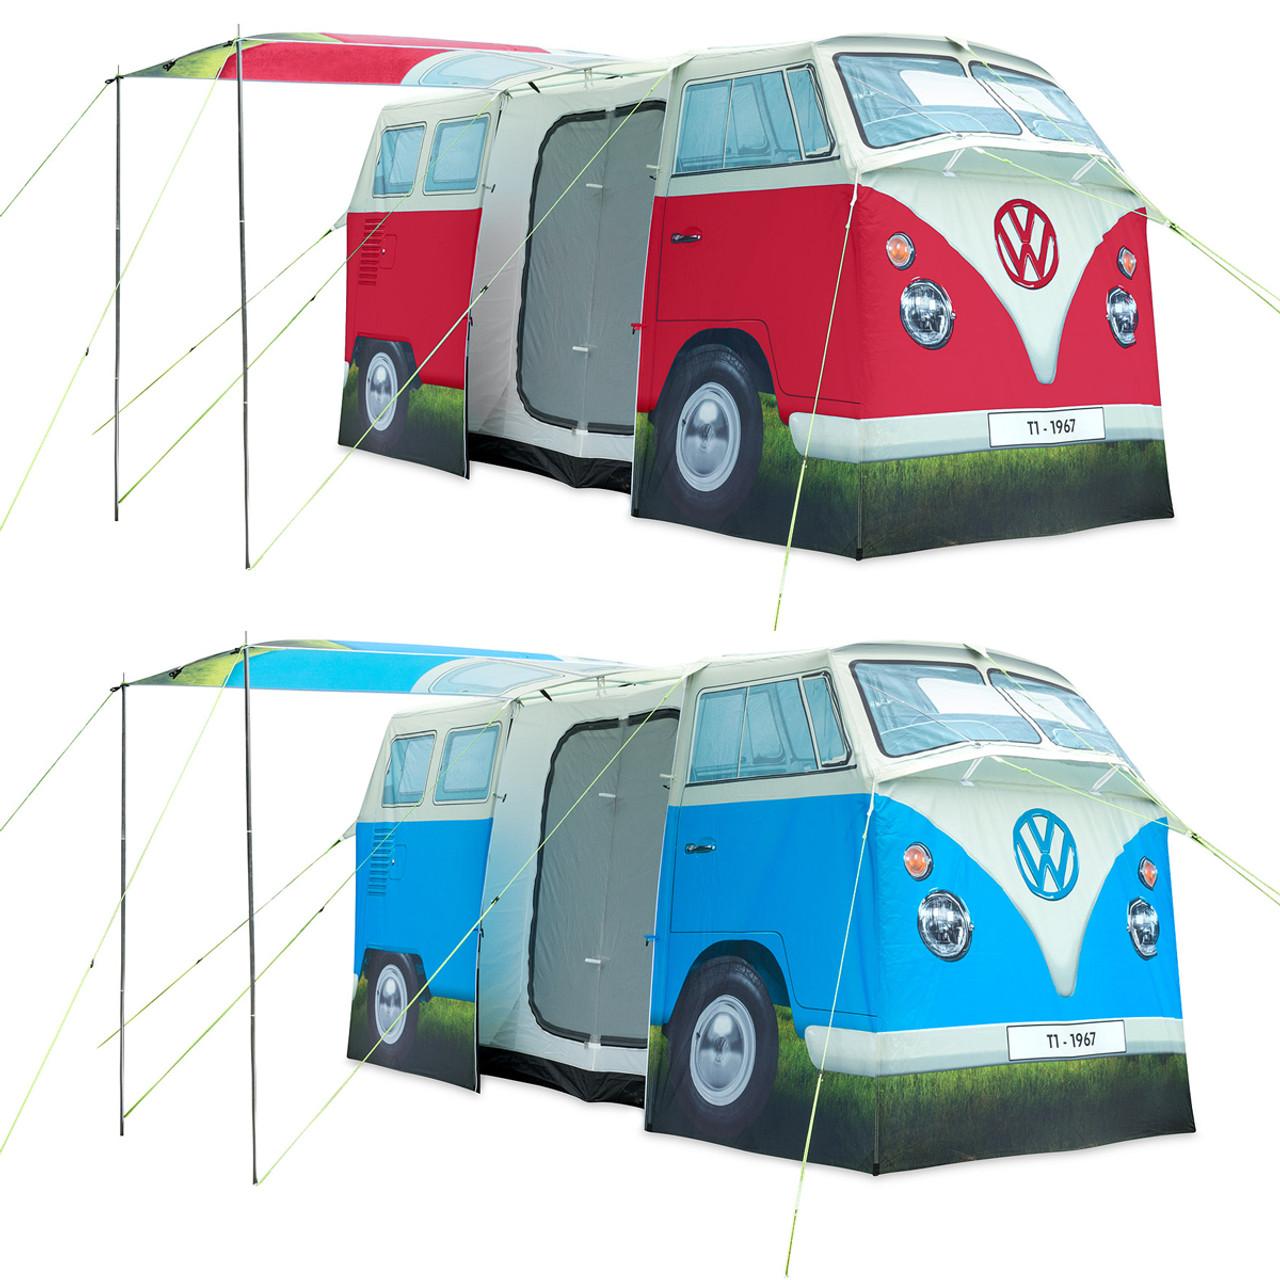 Vw Camper Van >> Adult Vw Campervan 4 Man Tent